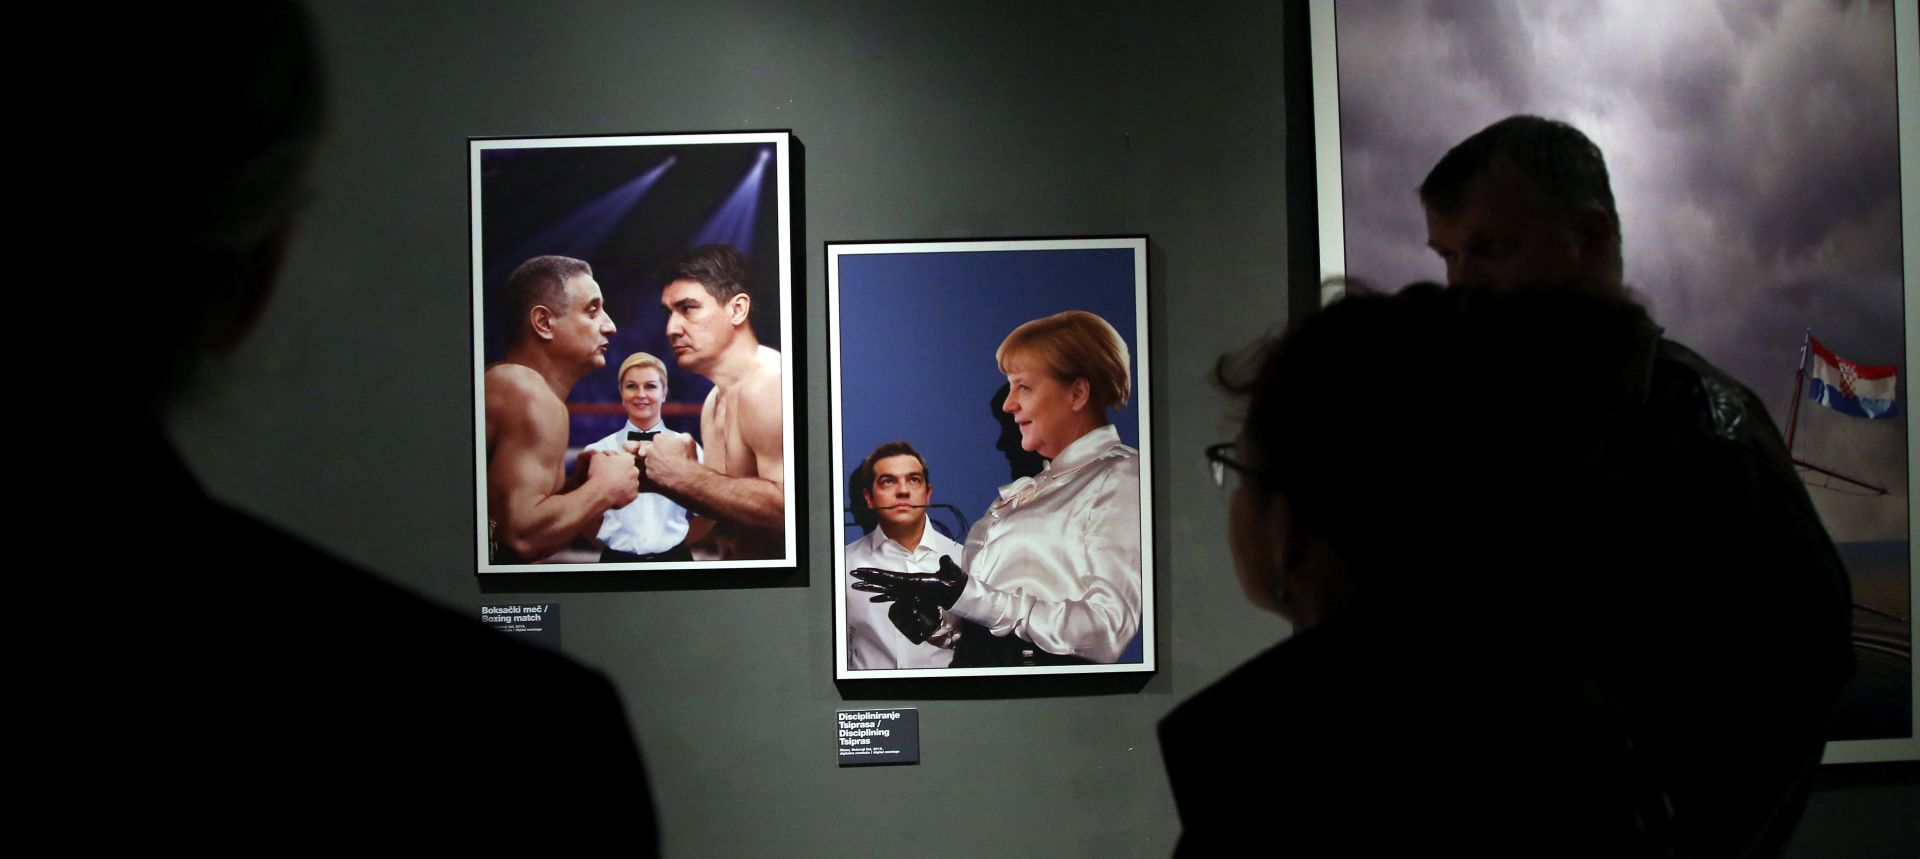 "Izložba ""Politika"" Milana Trenca u Muzeju za umjetnost i obrt"